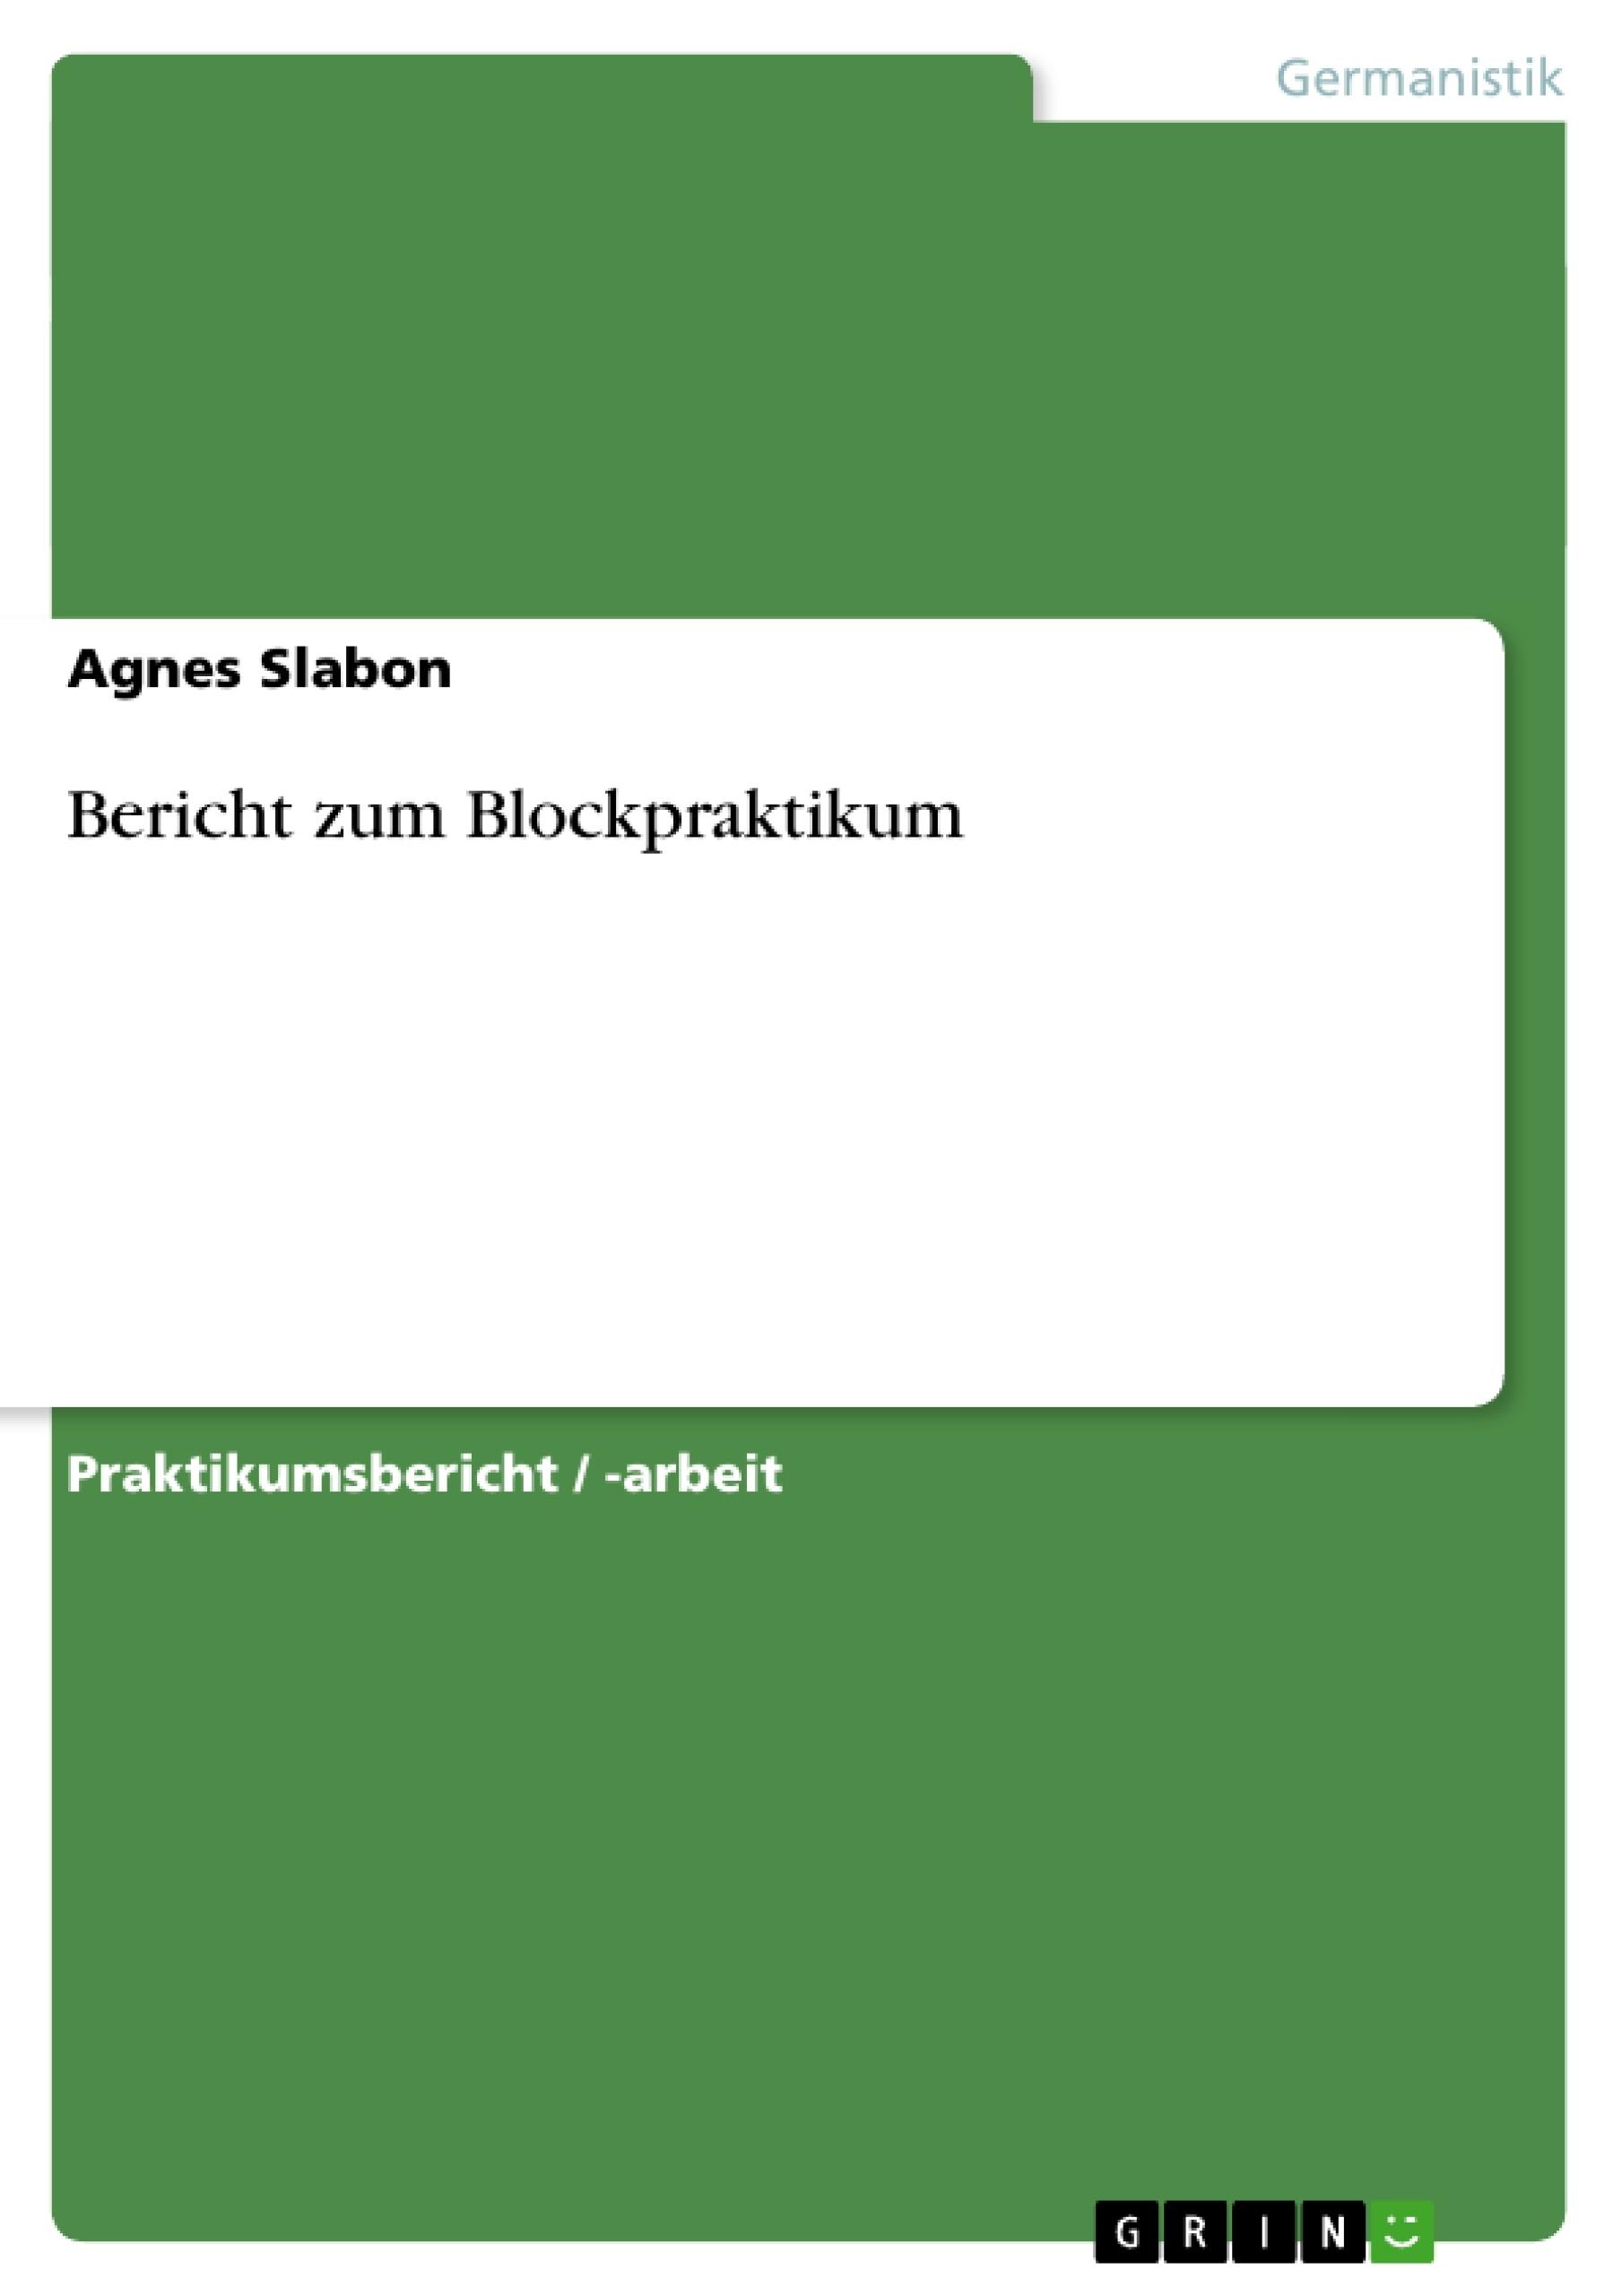 Titel: Bericht zum Blockpraktikum